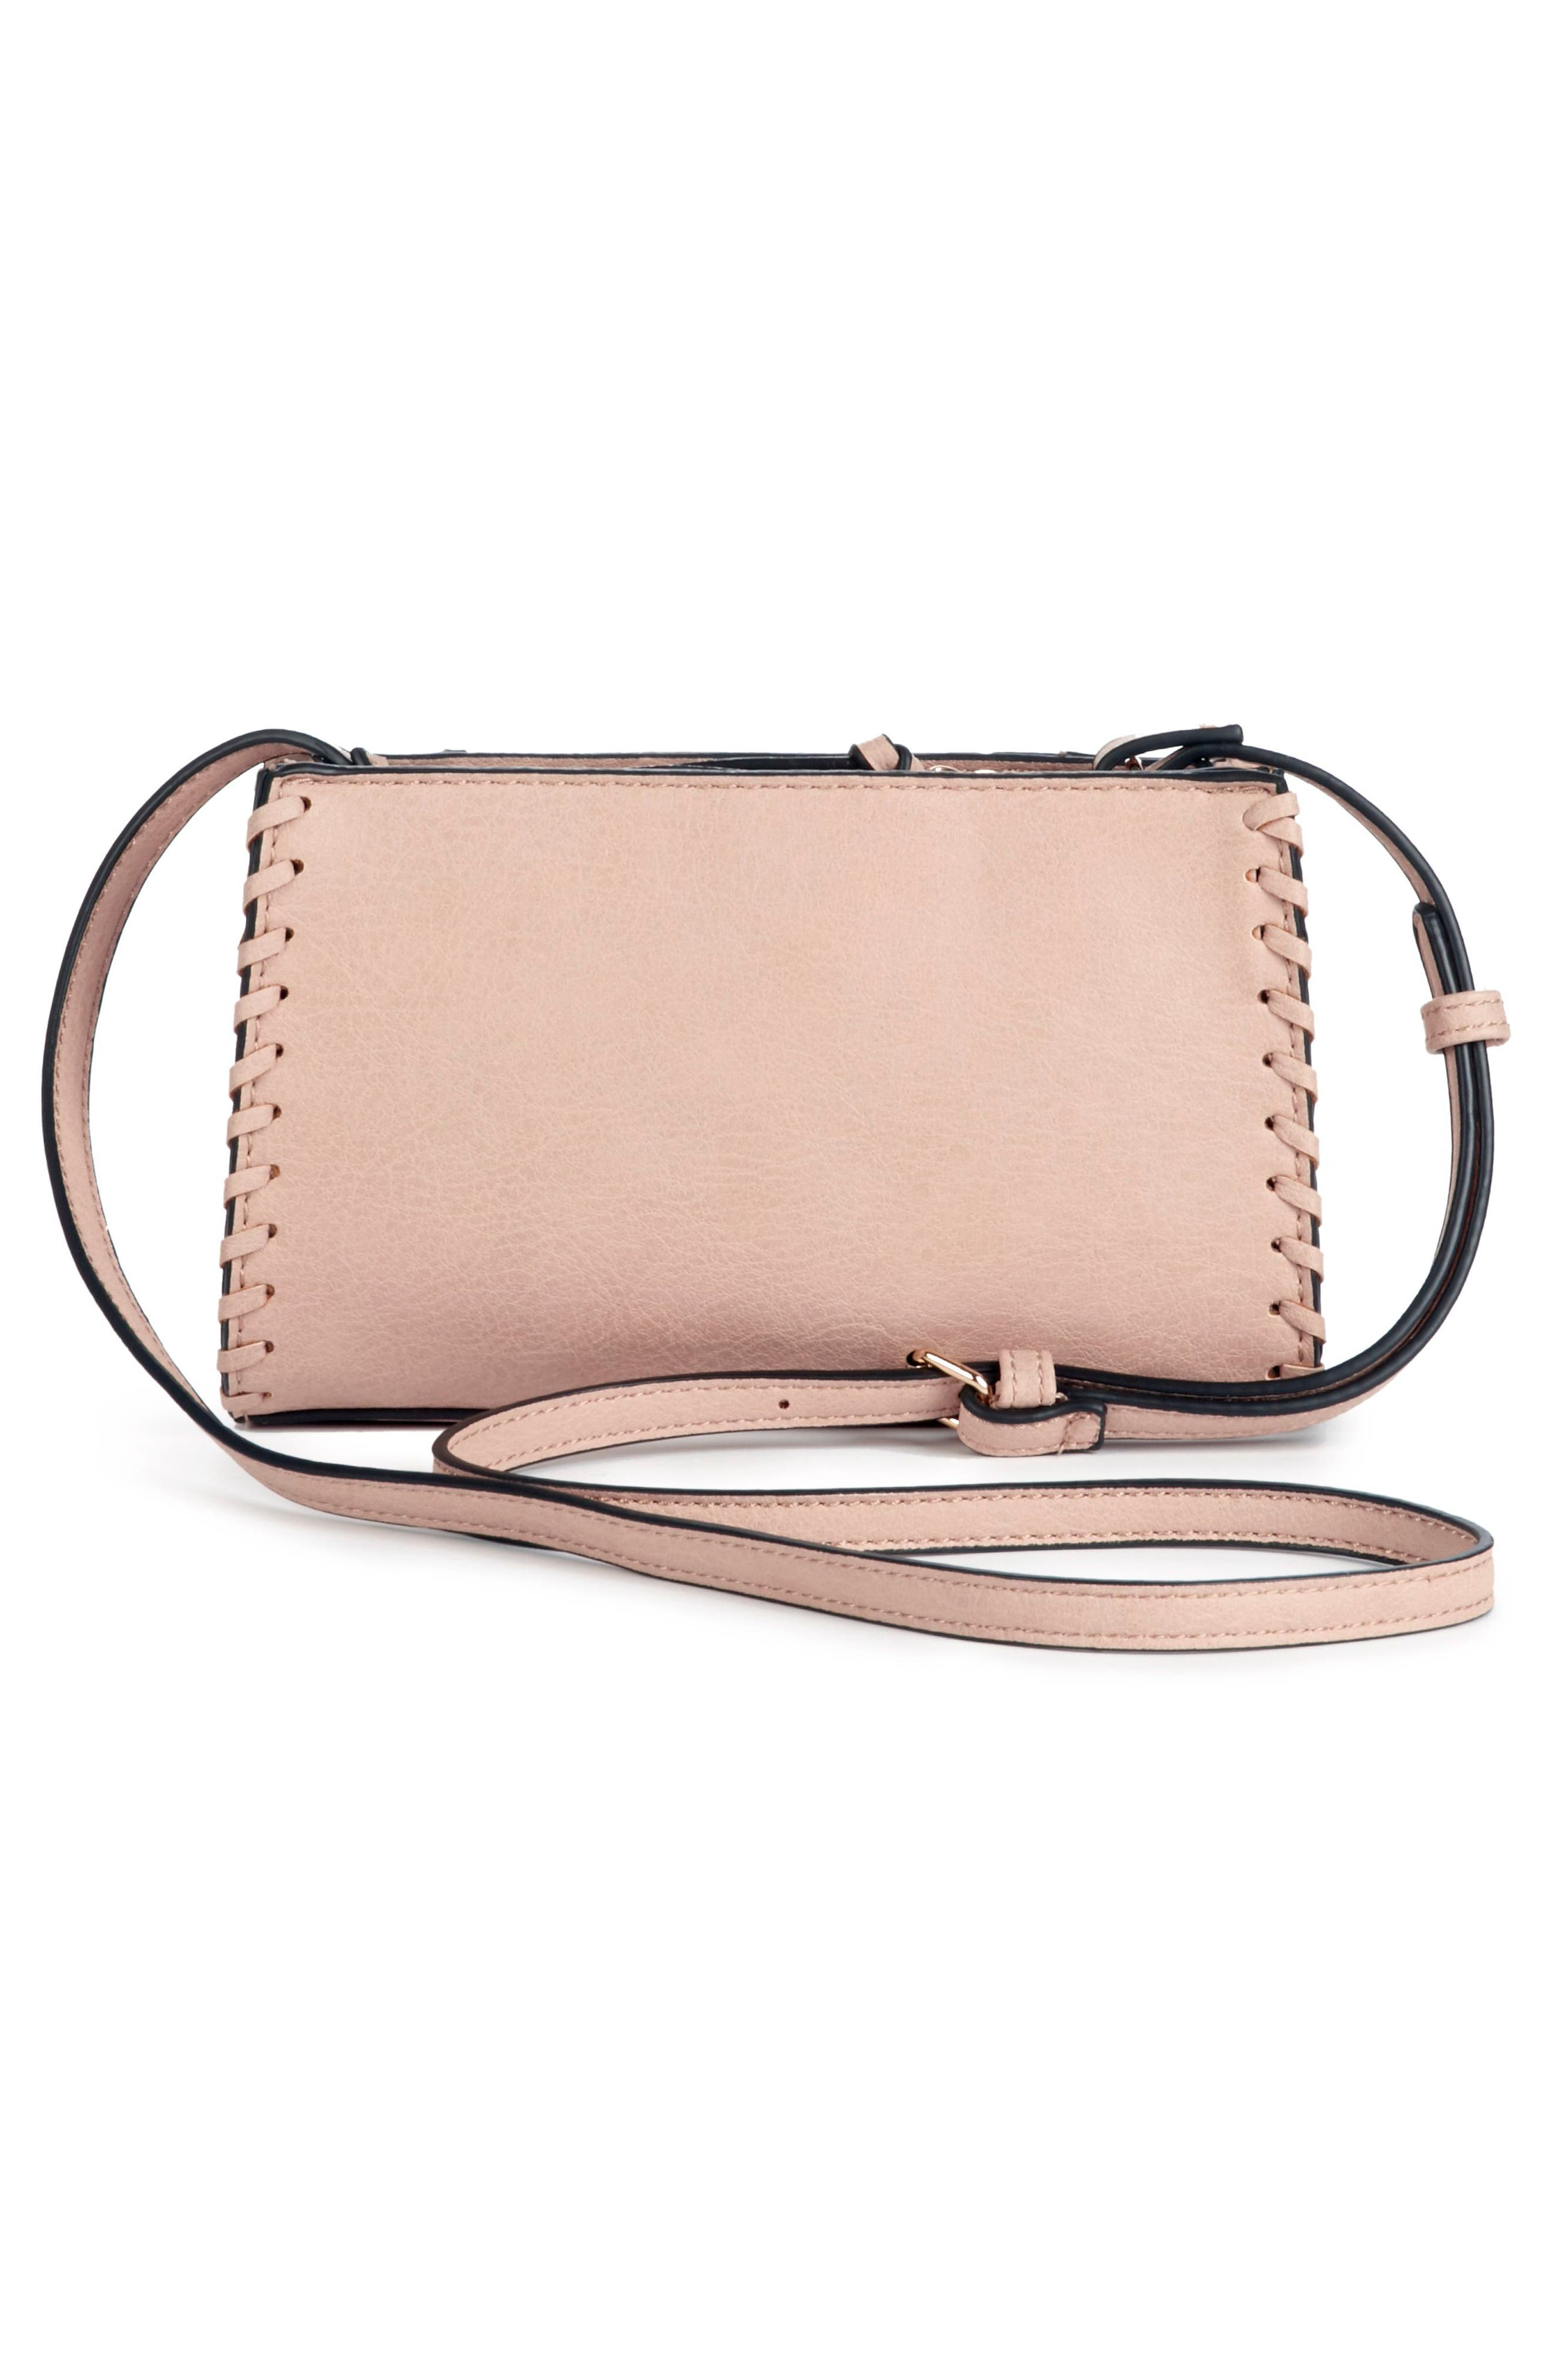 Destin Faux Leather Crossbody Bag,                             Alternate thumbnail 3, color,                             Blush